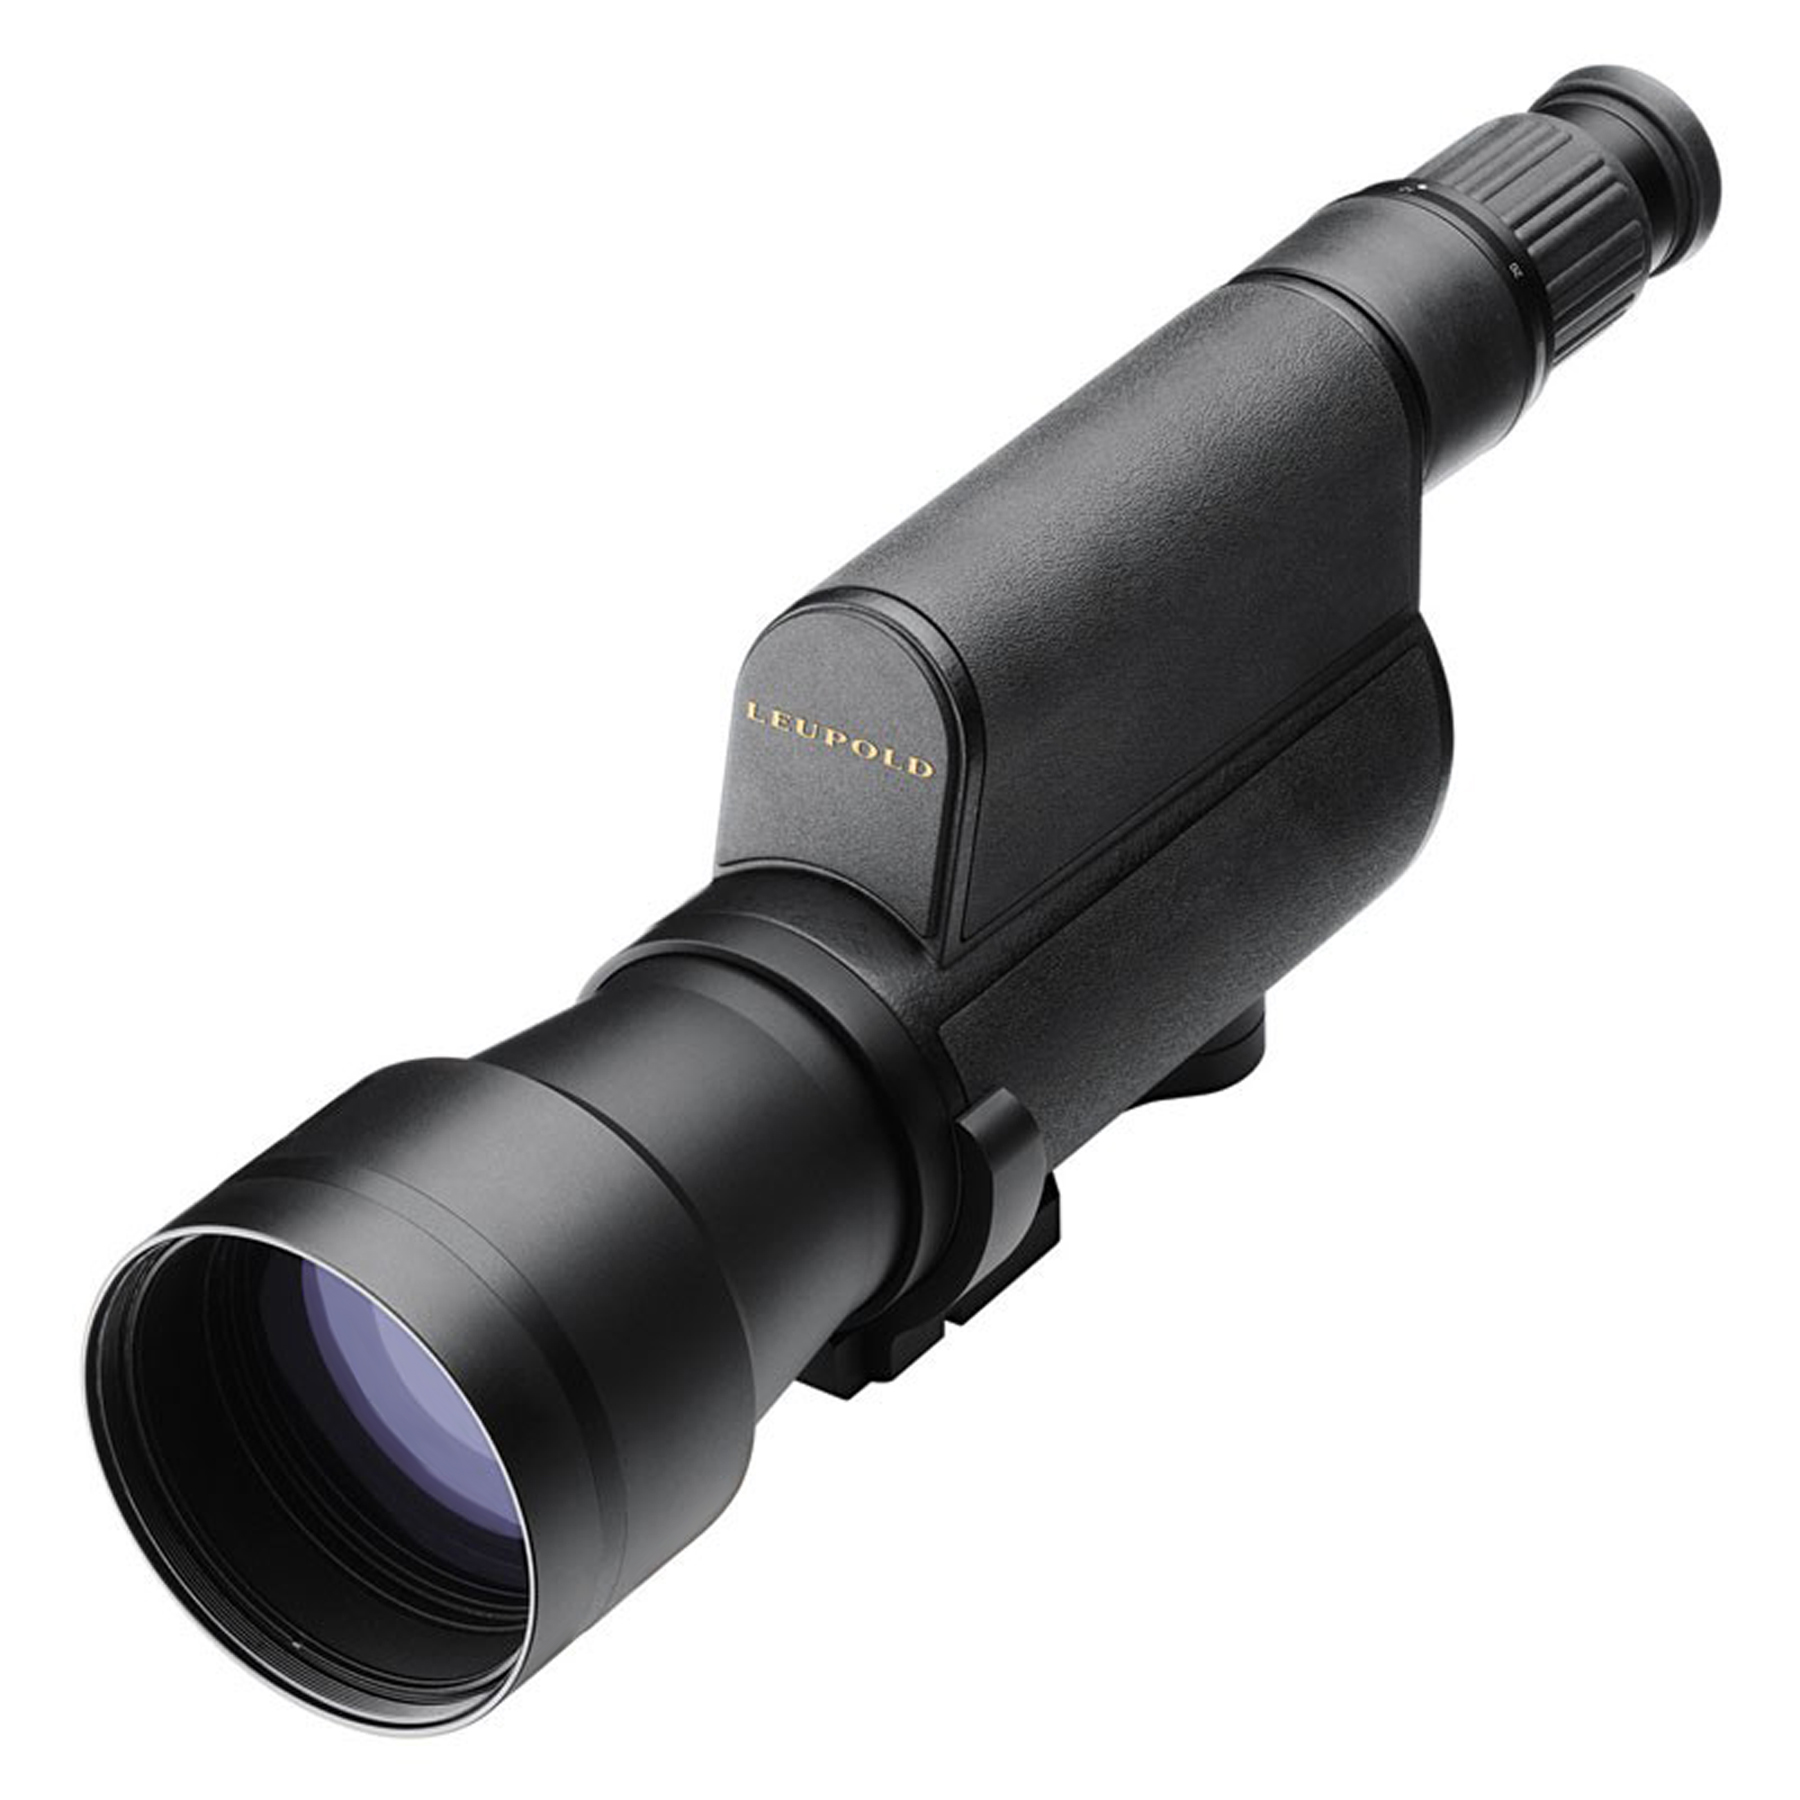 Mark 4 20-60x80mm Black Mil Dot